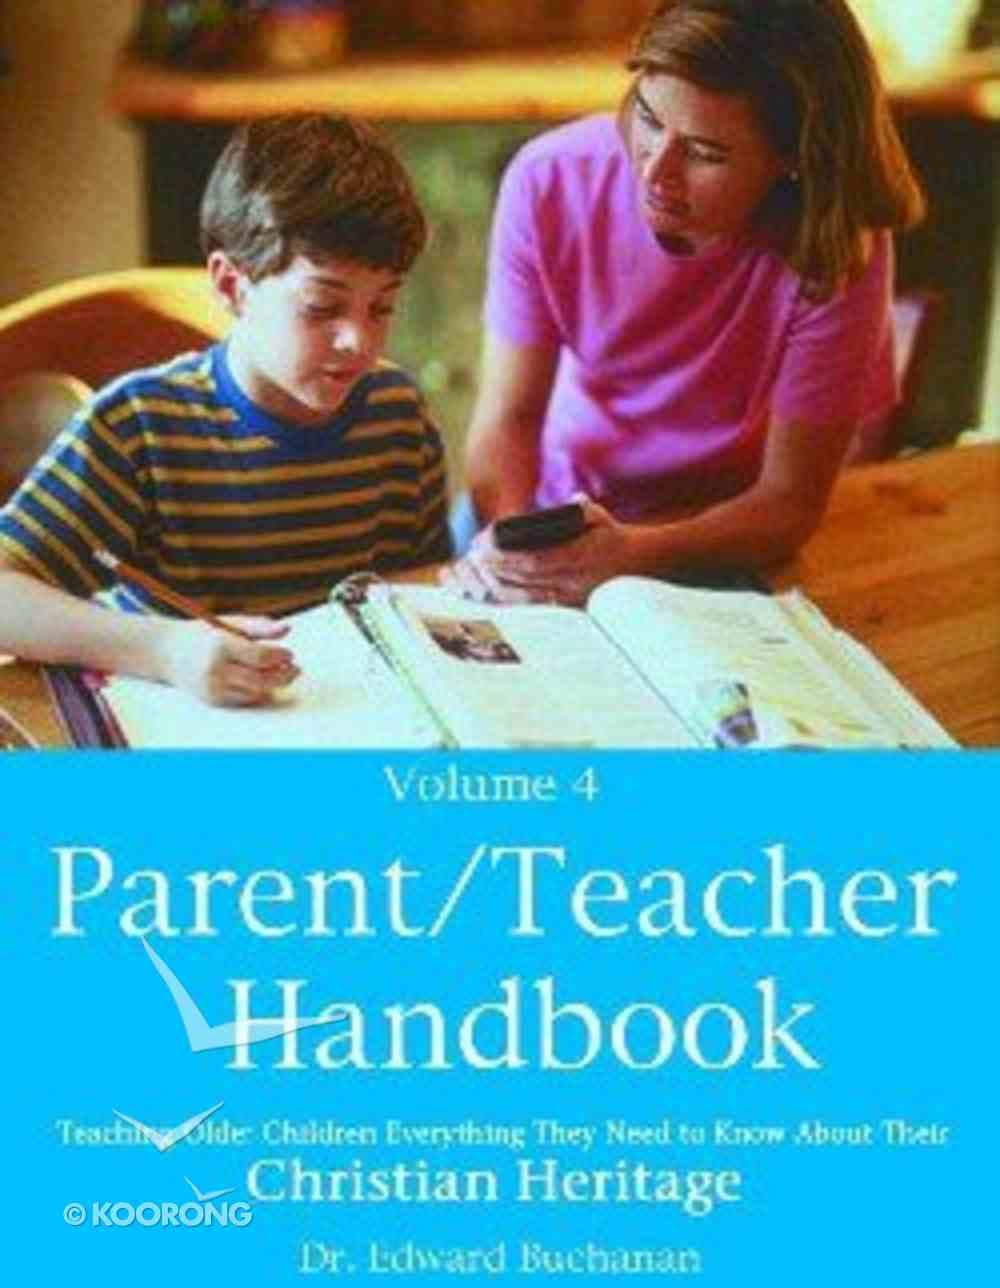 Parent/Teacher Handbook Volume 4 Paperback